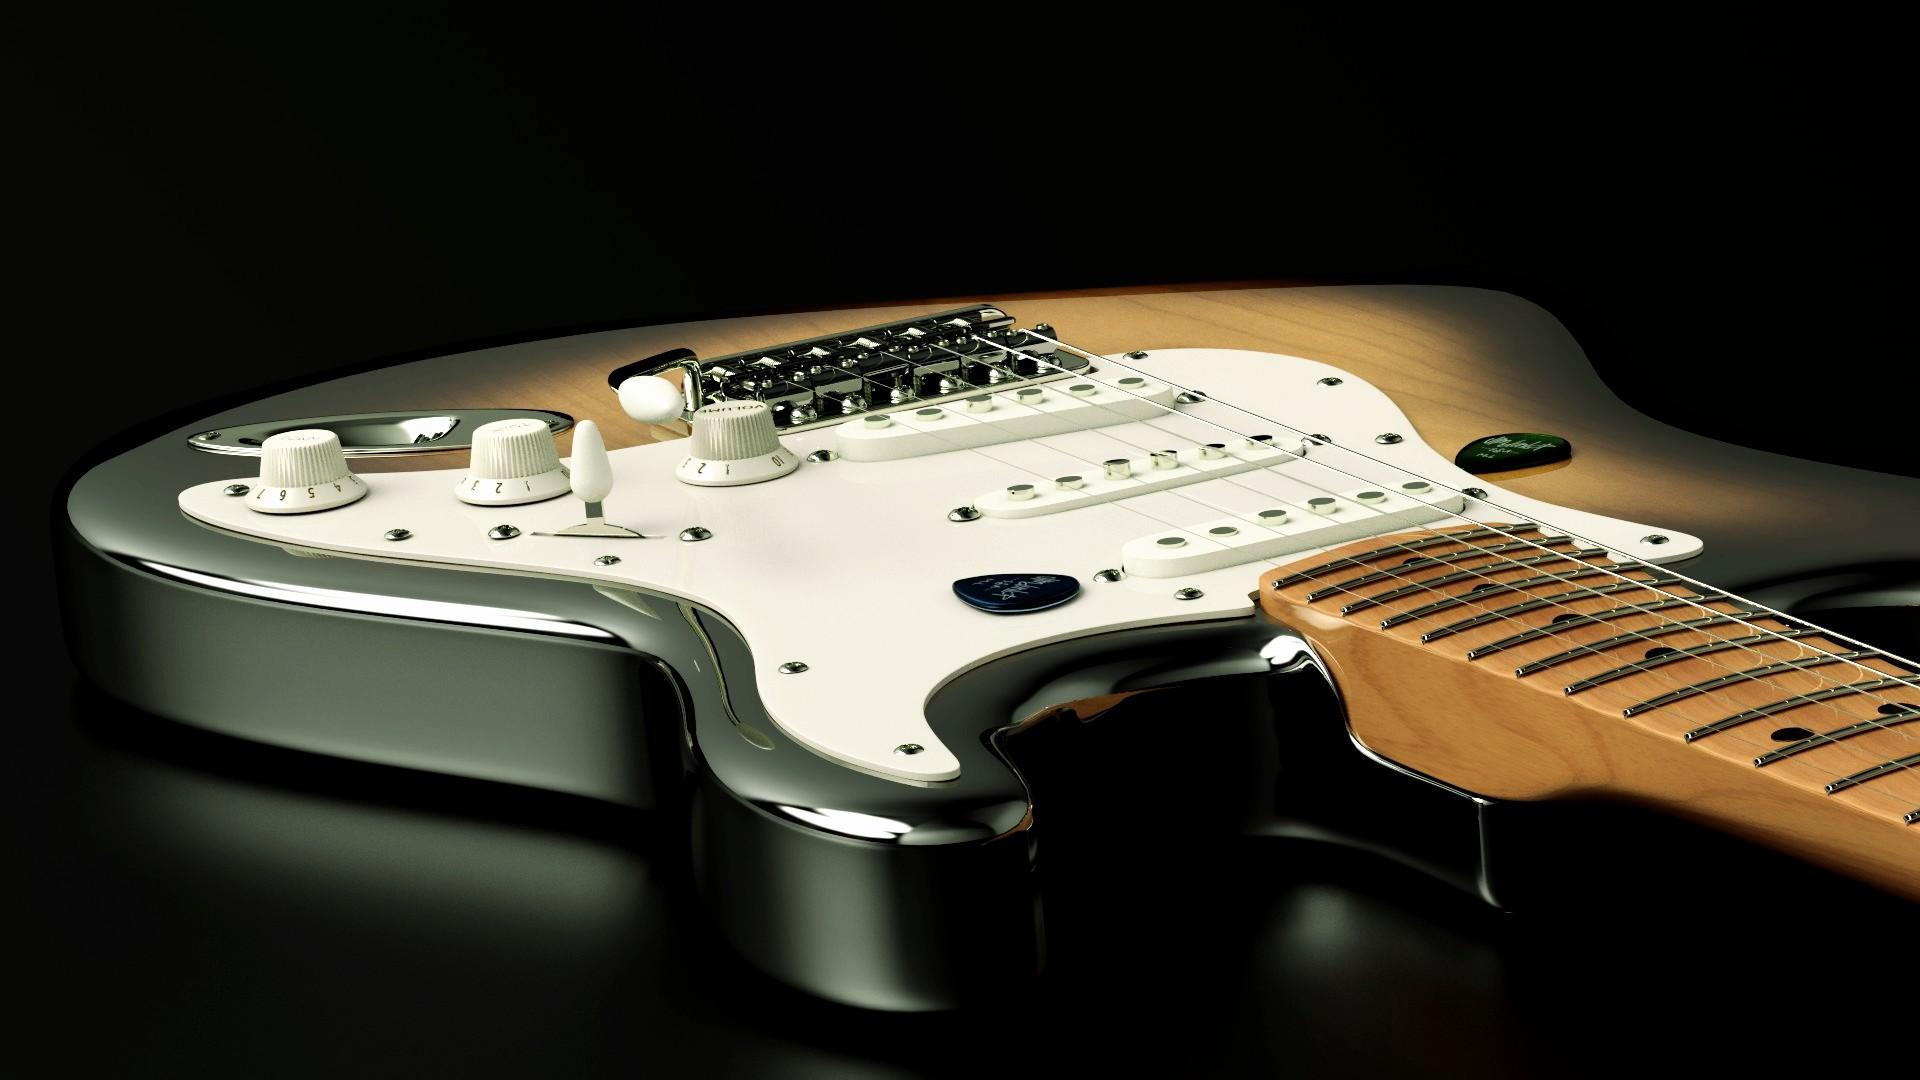 Fender Stratocaster Wallpaper Hd 63 Images